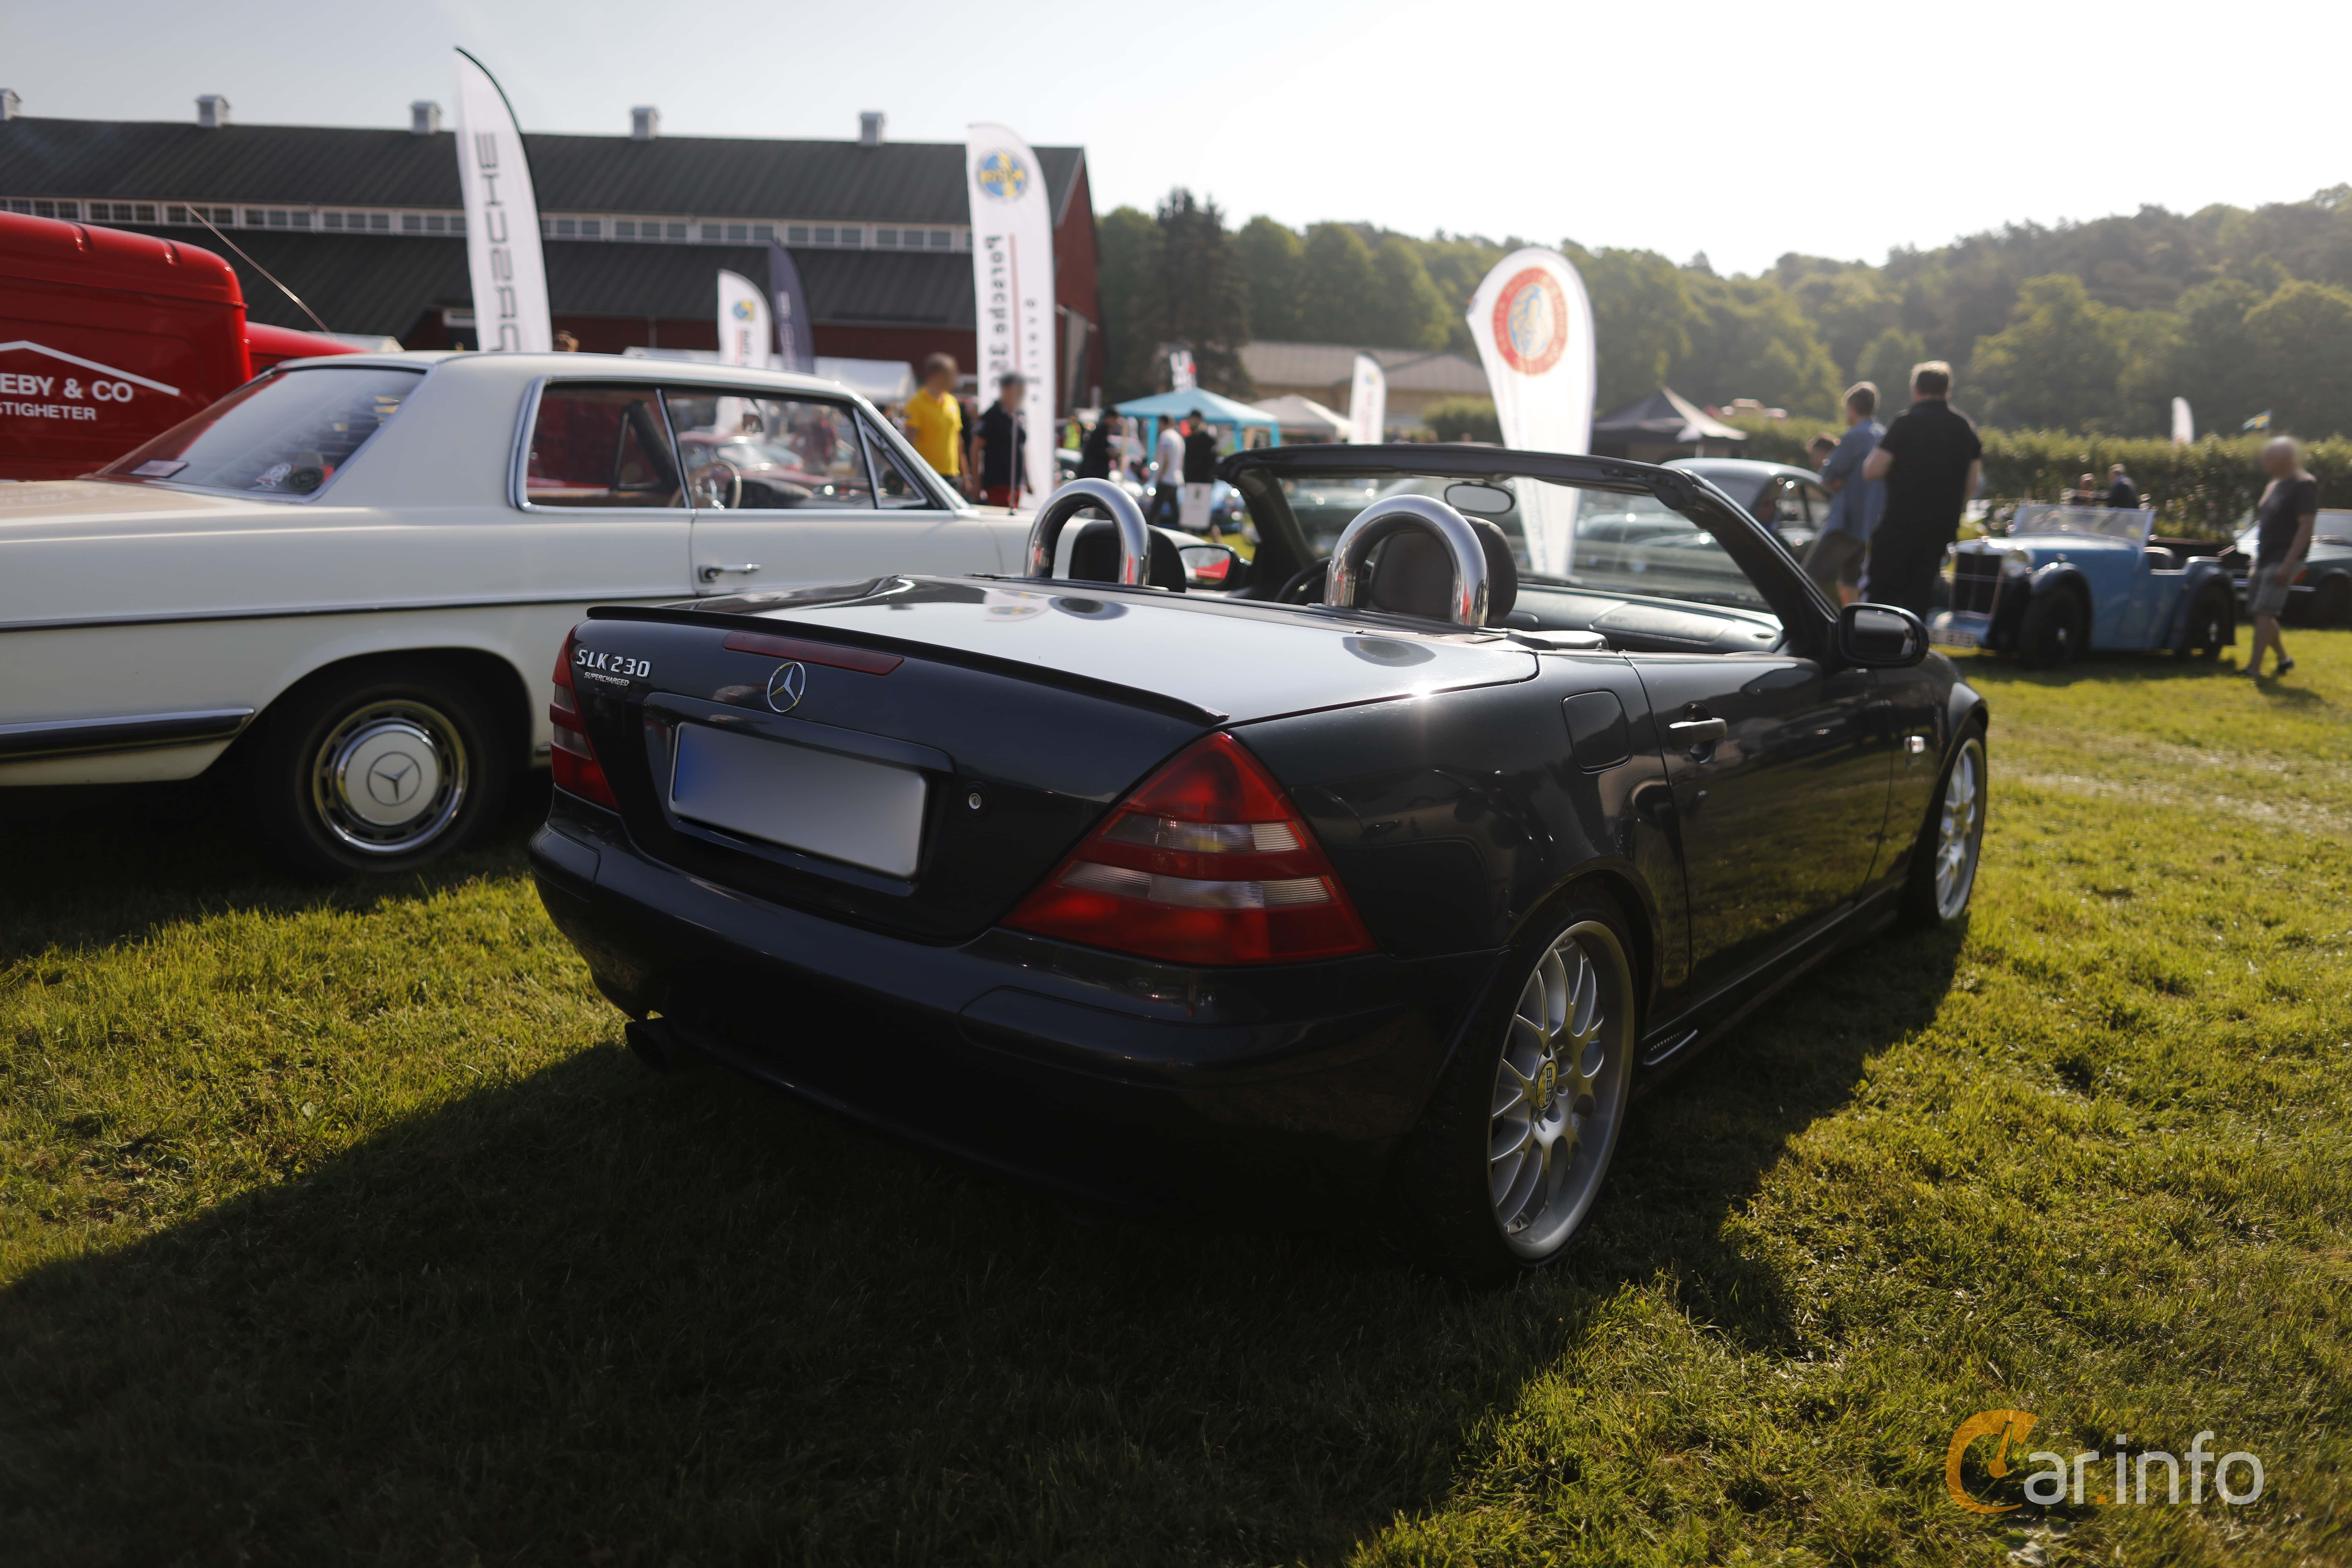 Mercedes-Benz SLK-Class Roadster R170 by jonasbonde